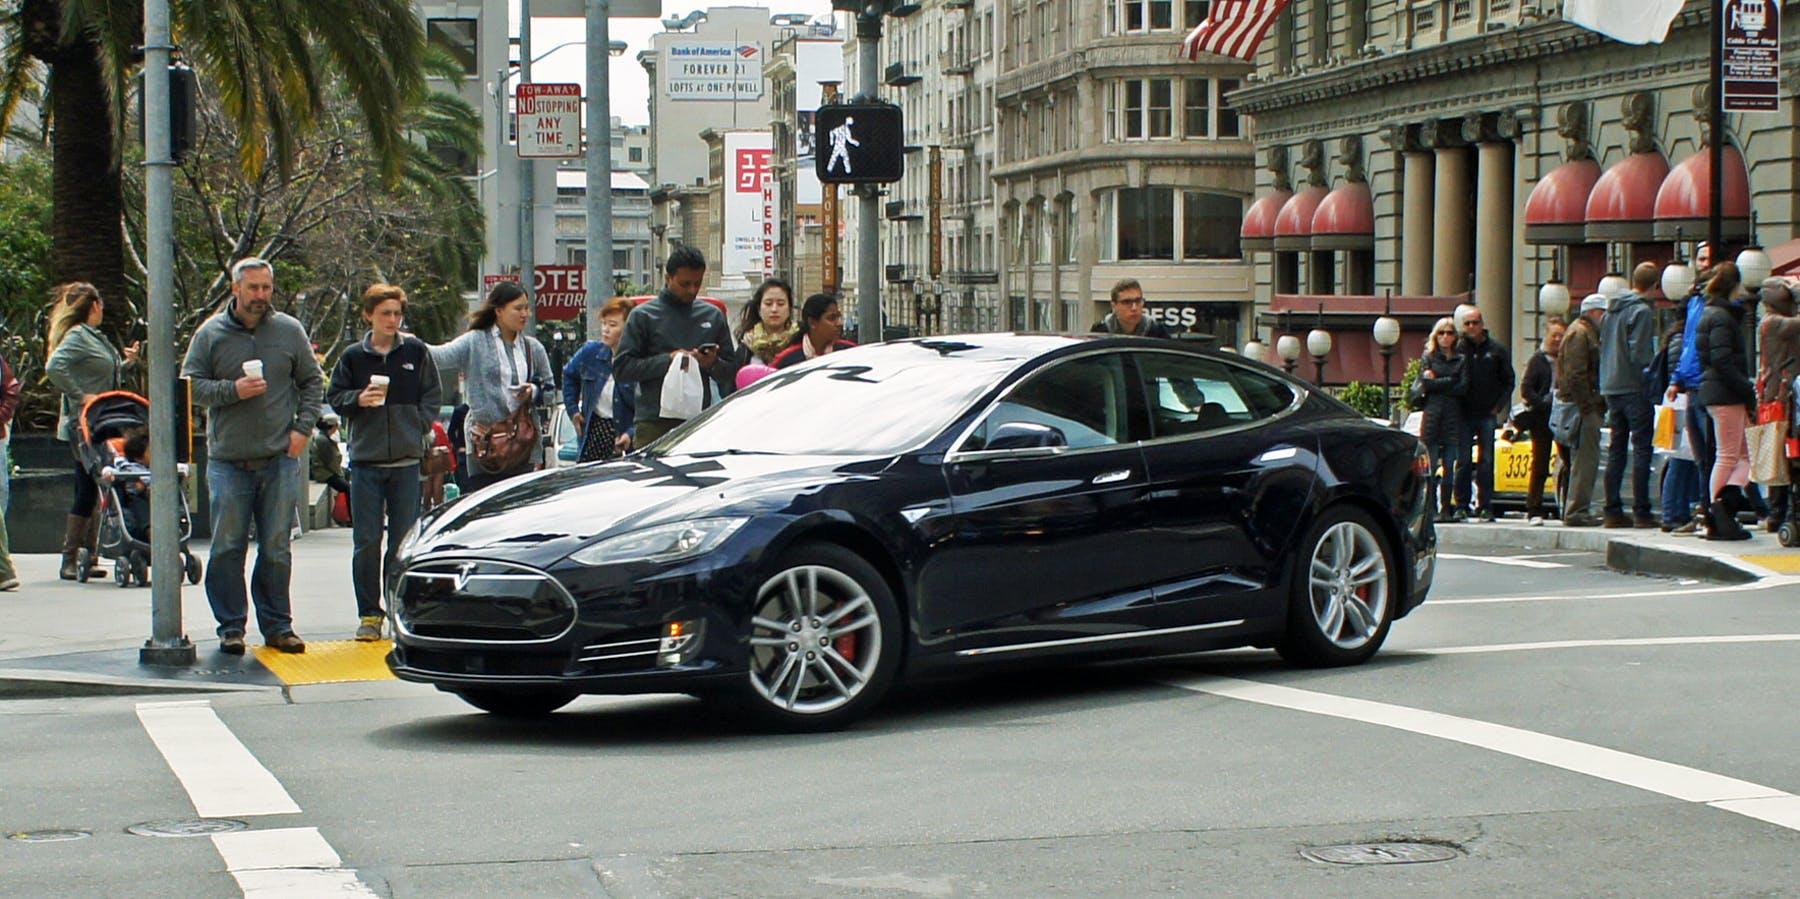 The 6 Autonomous Cars Already on American Roads